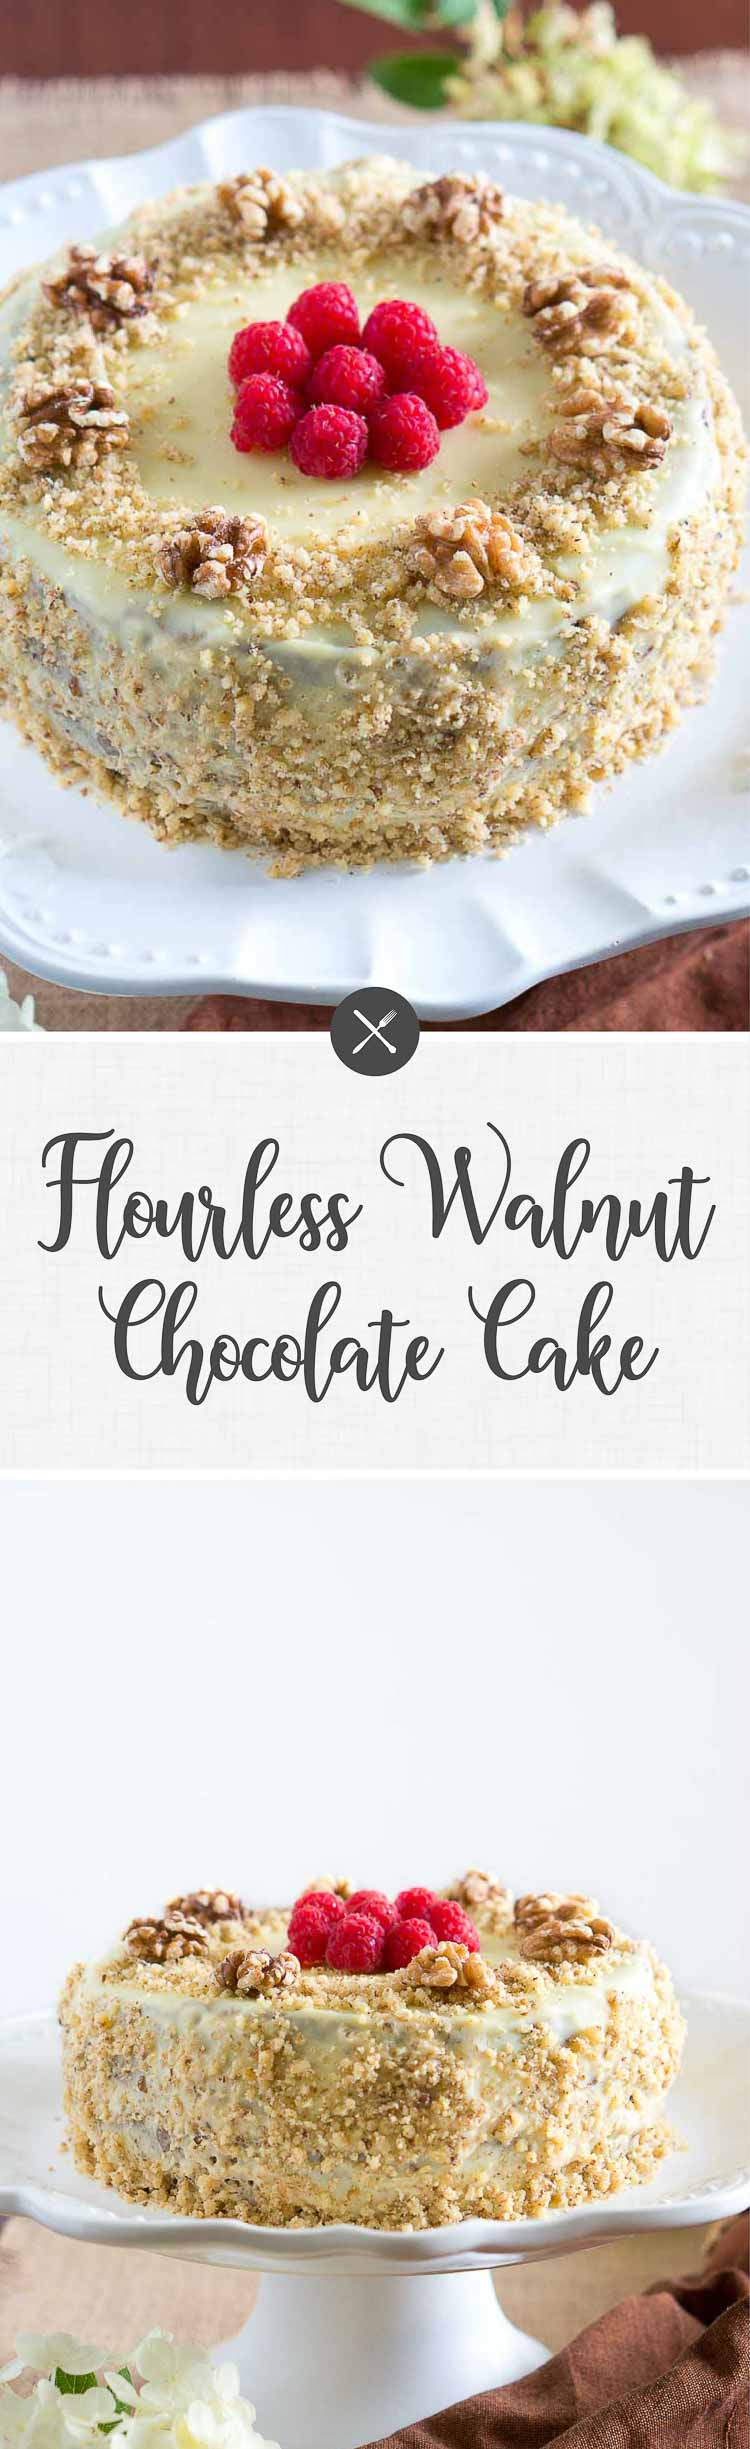 Decadent & light flourless walnut chocolate cake - so delicious! The white chocolate glaze pairs wonderfully with the walnut cream between the layers. #cake #glutenfree #paleo #dessert #healthy